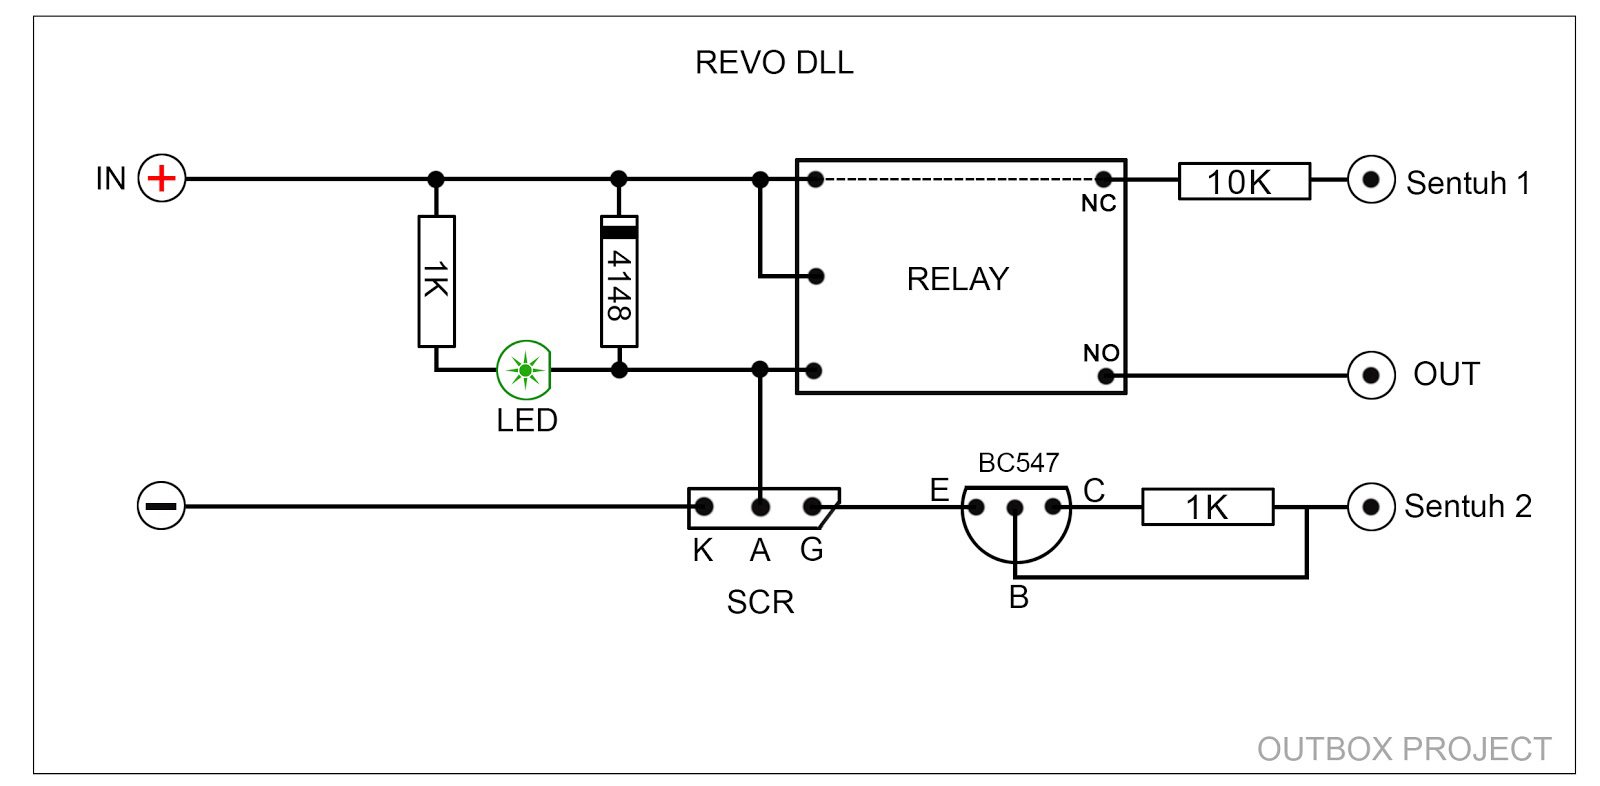 outbox project membuat pengaman motor sederhana dengan sensor